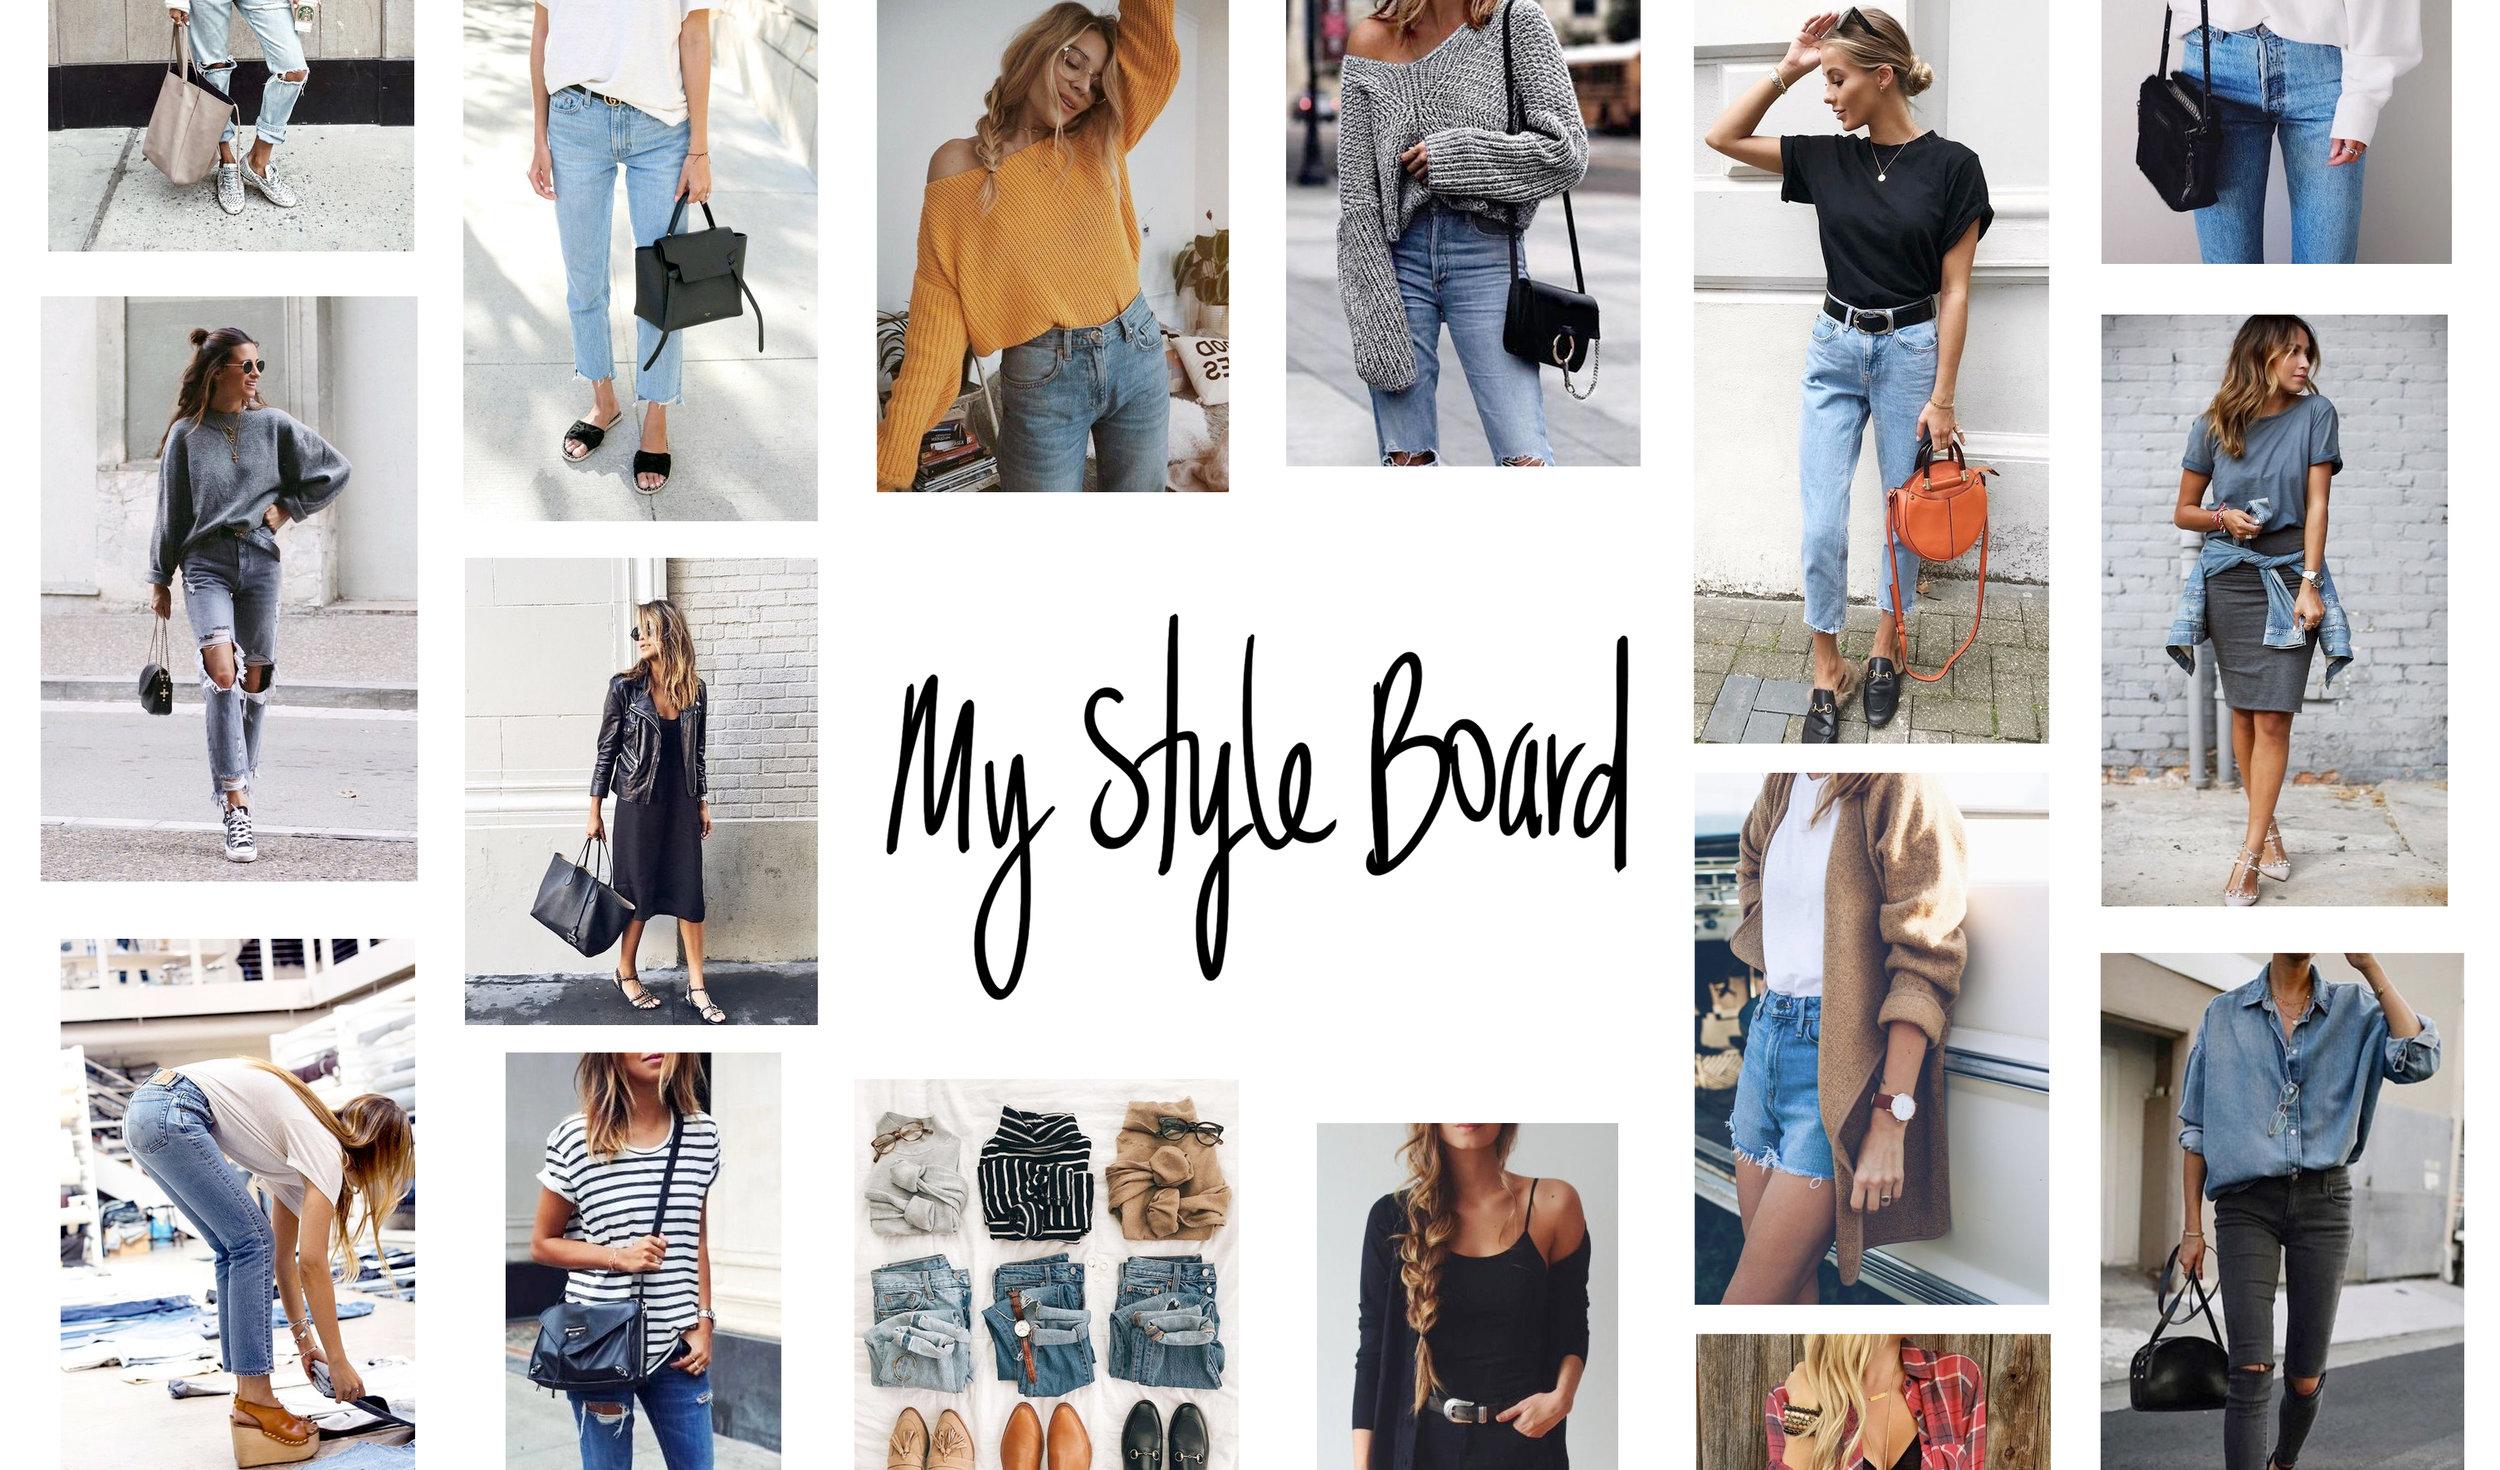 Wardrobe Overhaul 3: The Style Quest